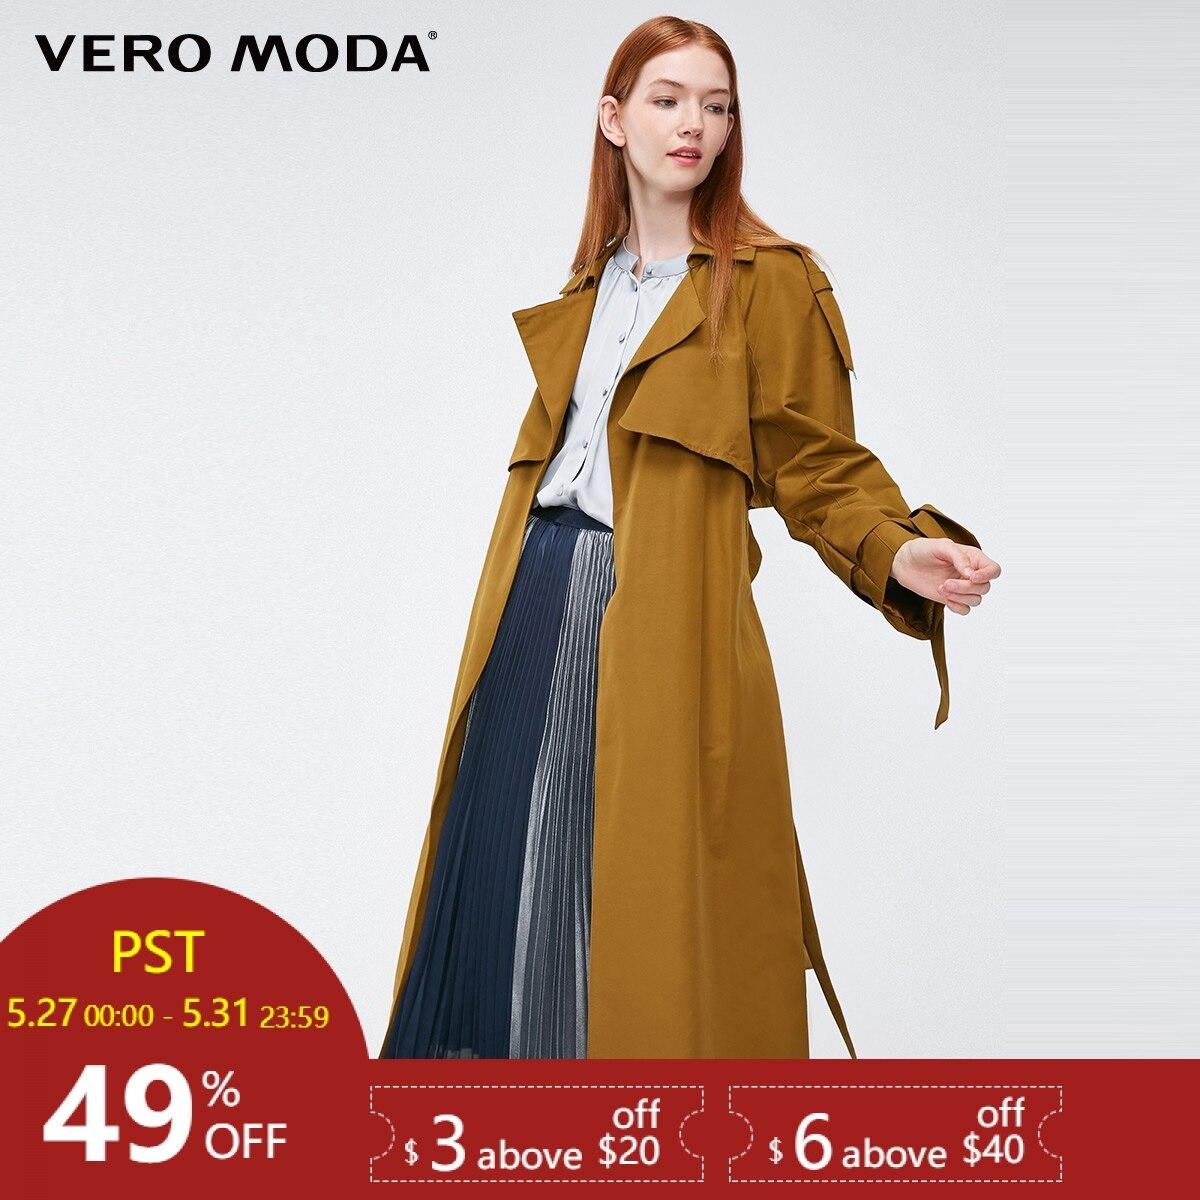 Vero Moda 2019 new windshield design cuffs decorated long   trench   coat|318321508